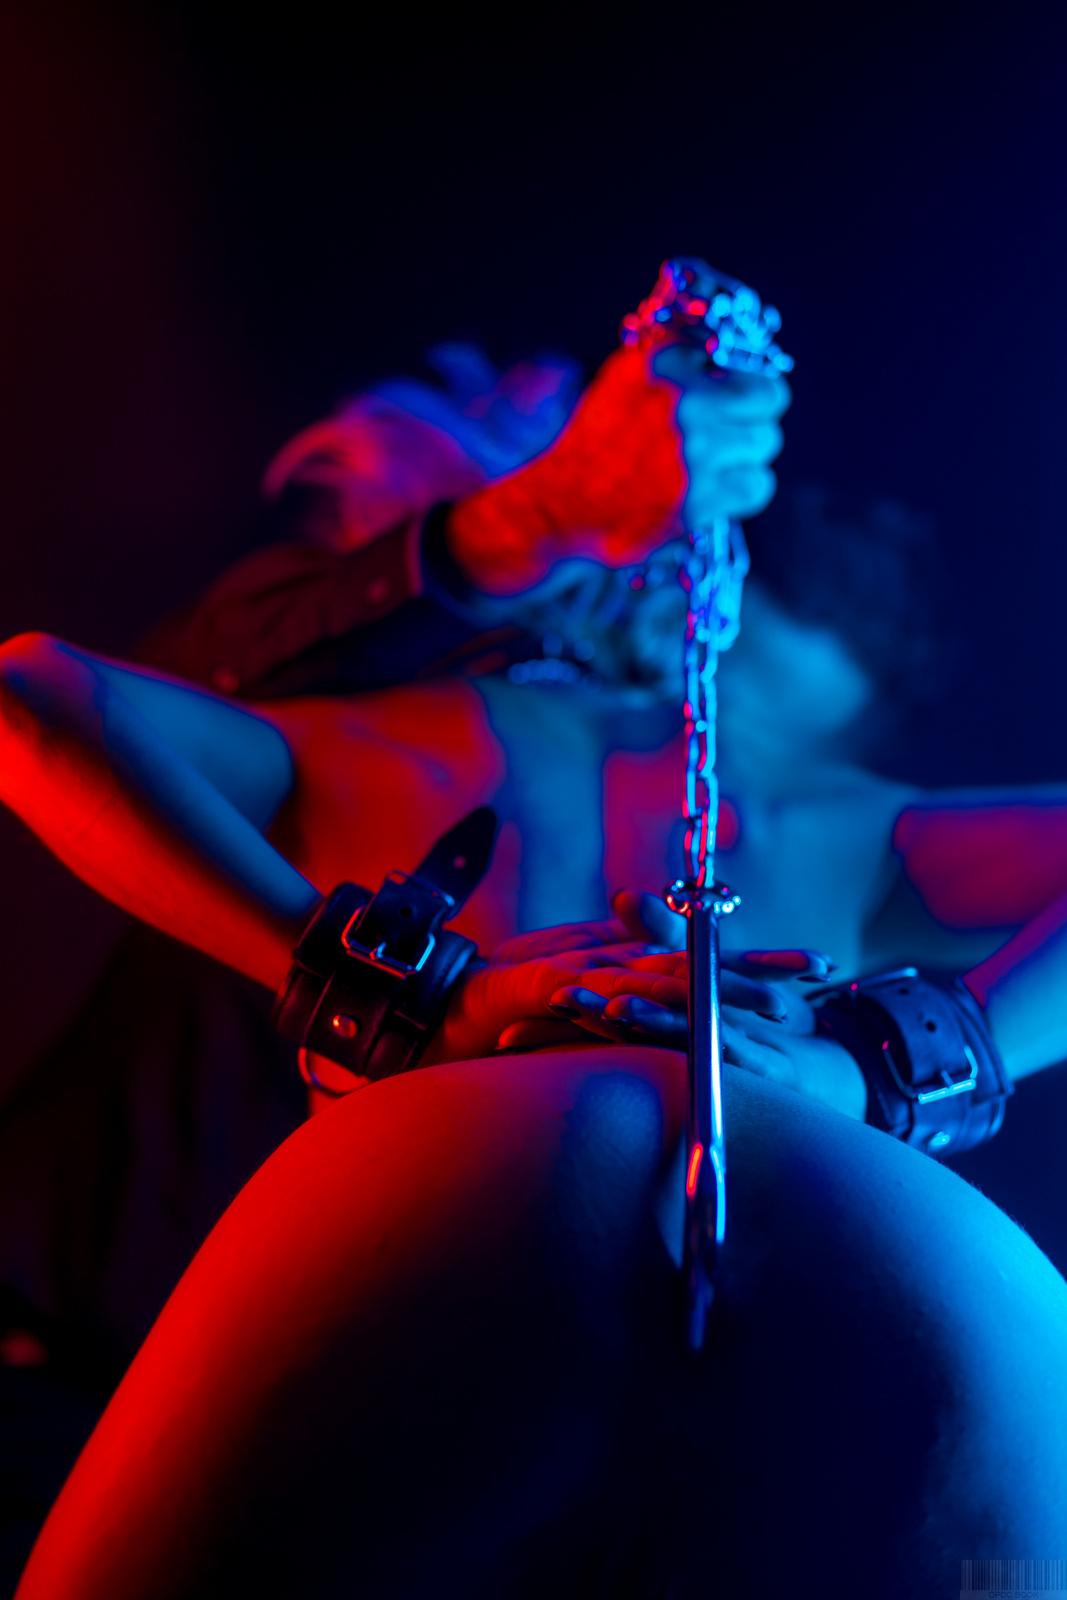 Intrusion Pornart • Art Érotique et PornArt • Hot Collection